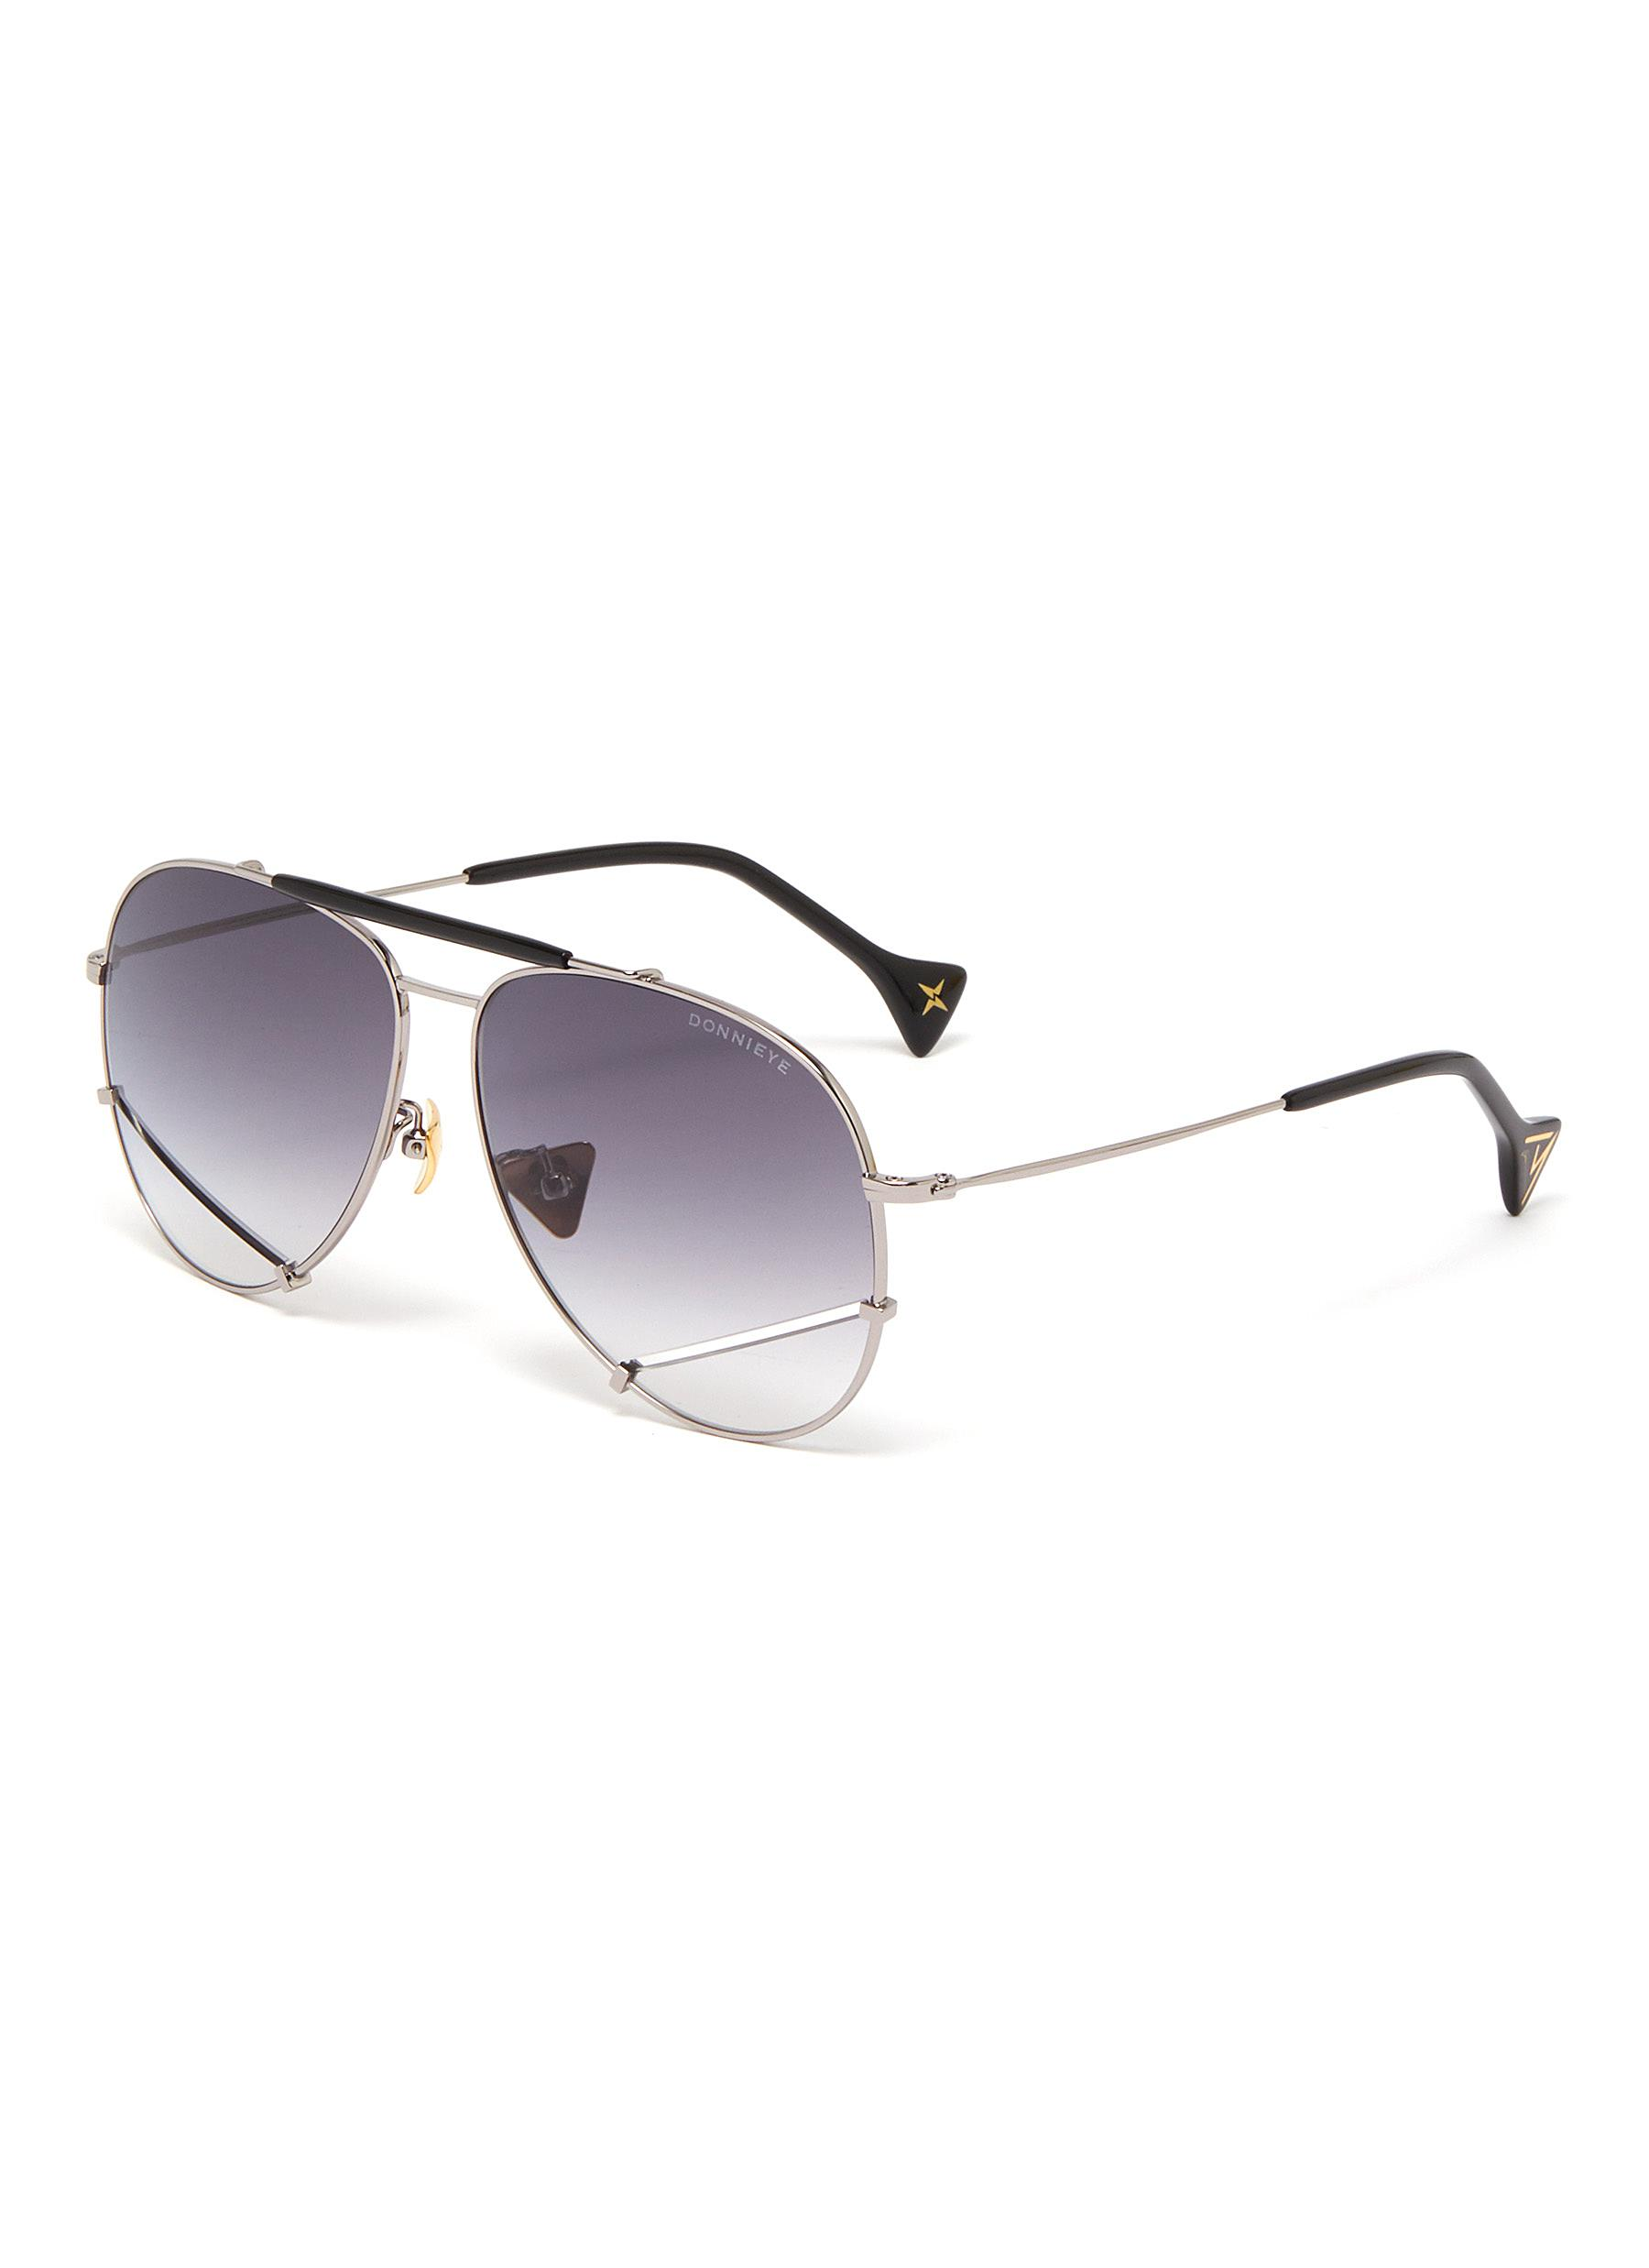 'Optimist' metal frame aviator sunglasses